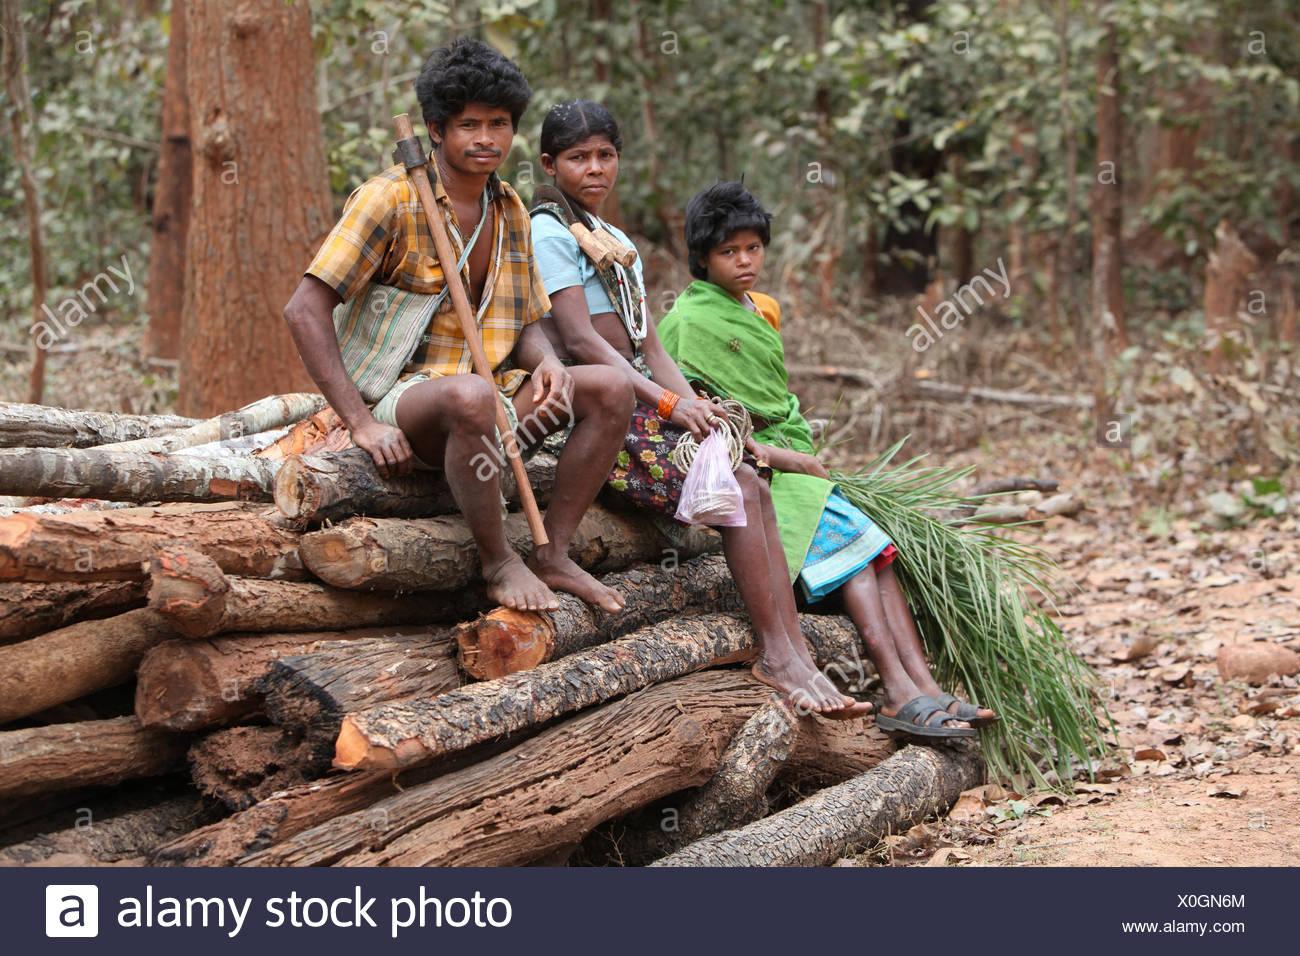 Abhuj Maria Tribal Family sitting on wood logs in Rainpul forest, Orrcha, Chattisgadh, India - Stock Image